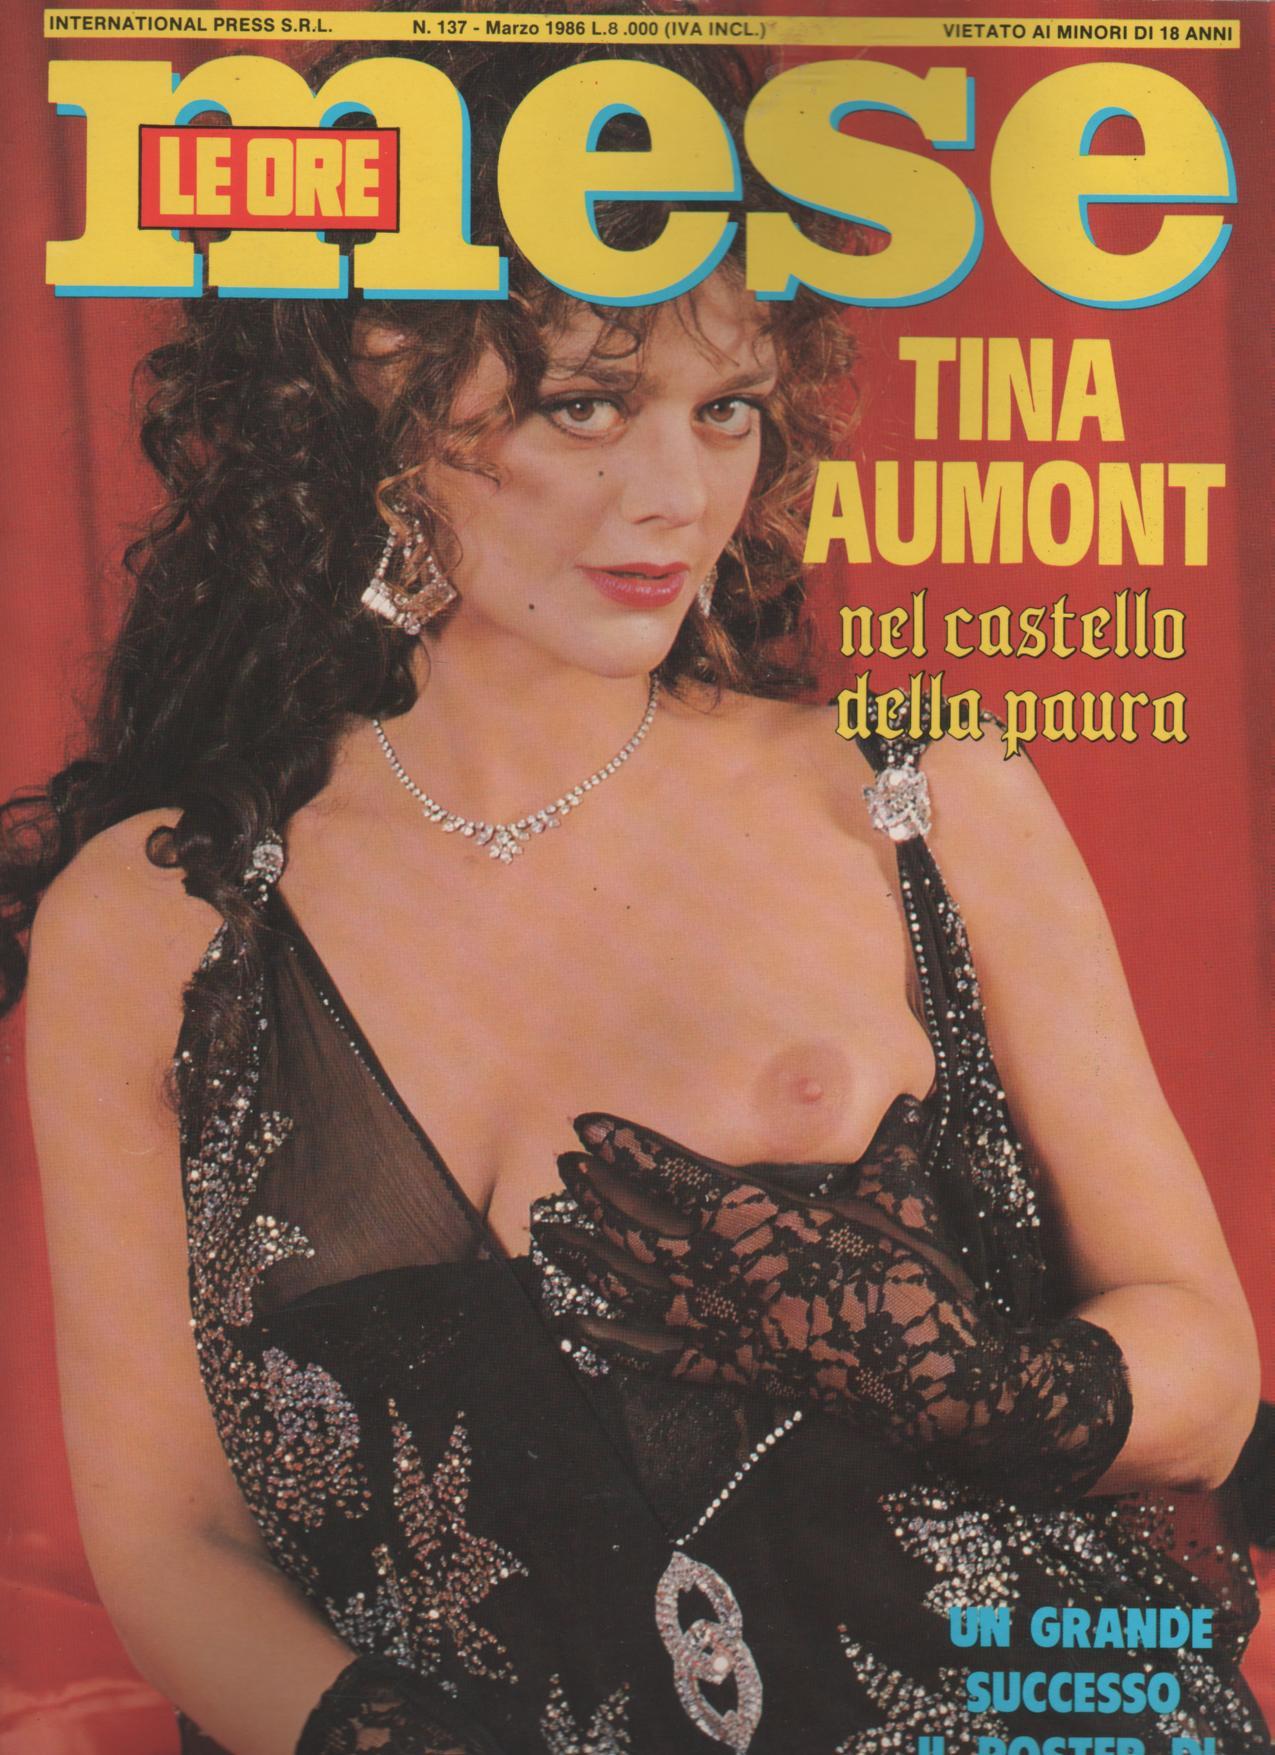 MESE LE ORE  # 137 / 1986  con  TINA AUMONT hard